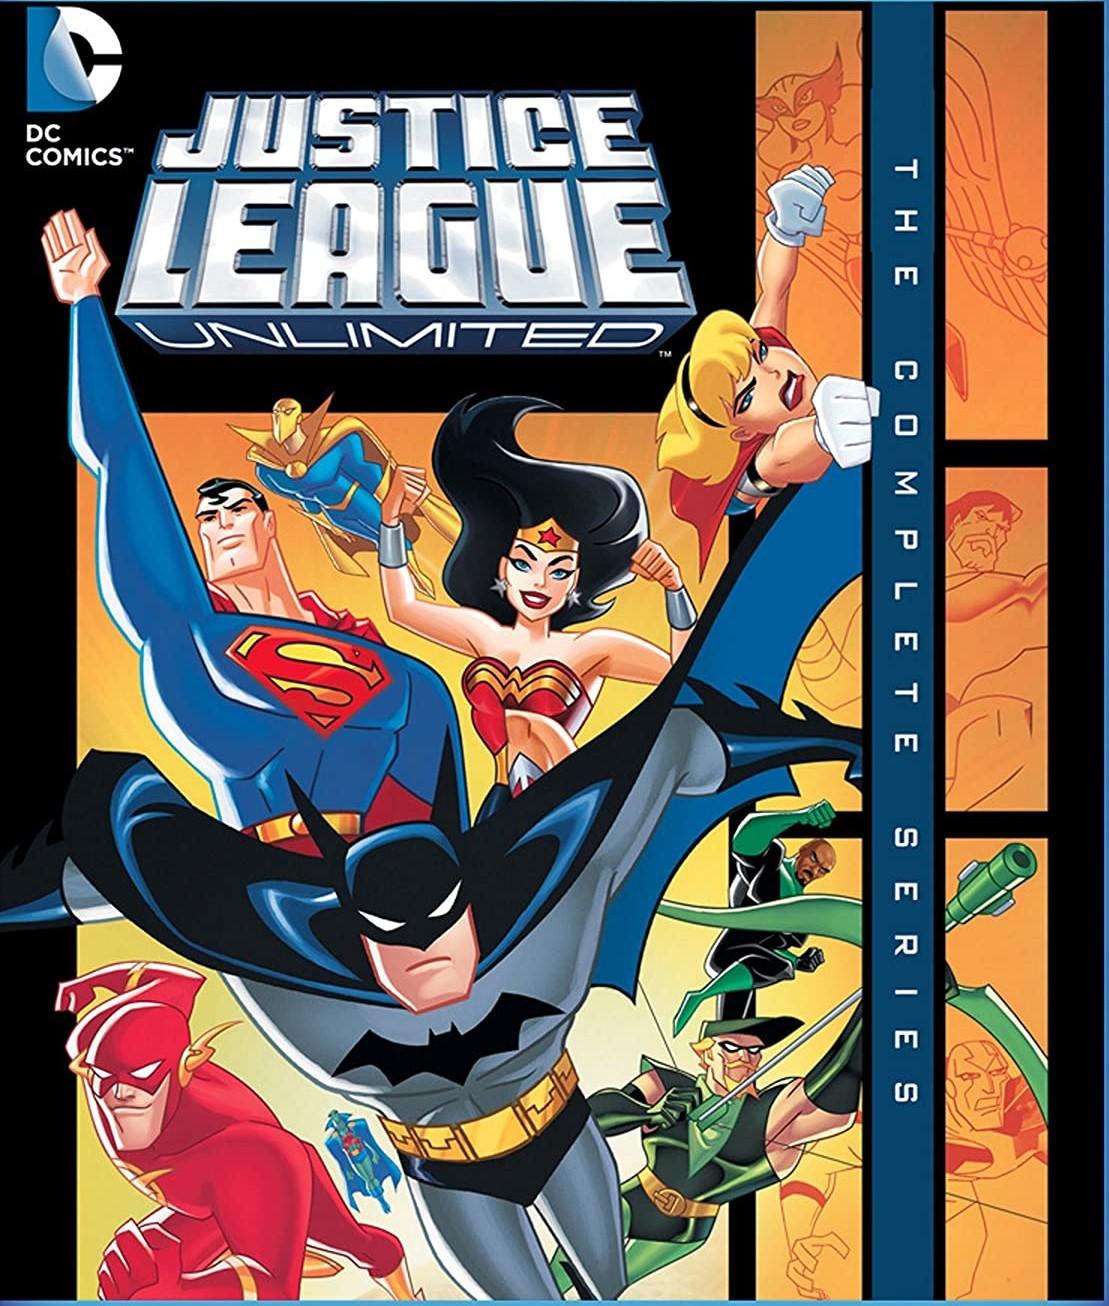 Justice League Unlimited 2